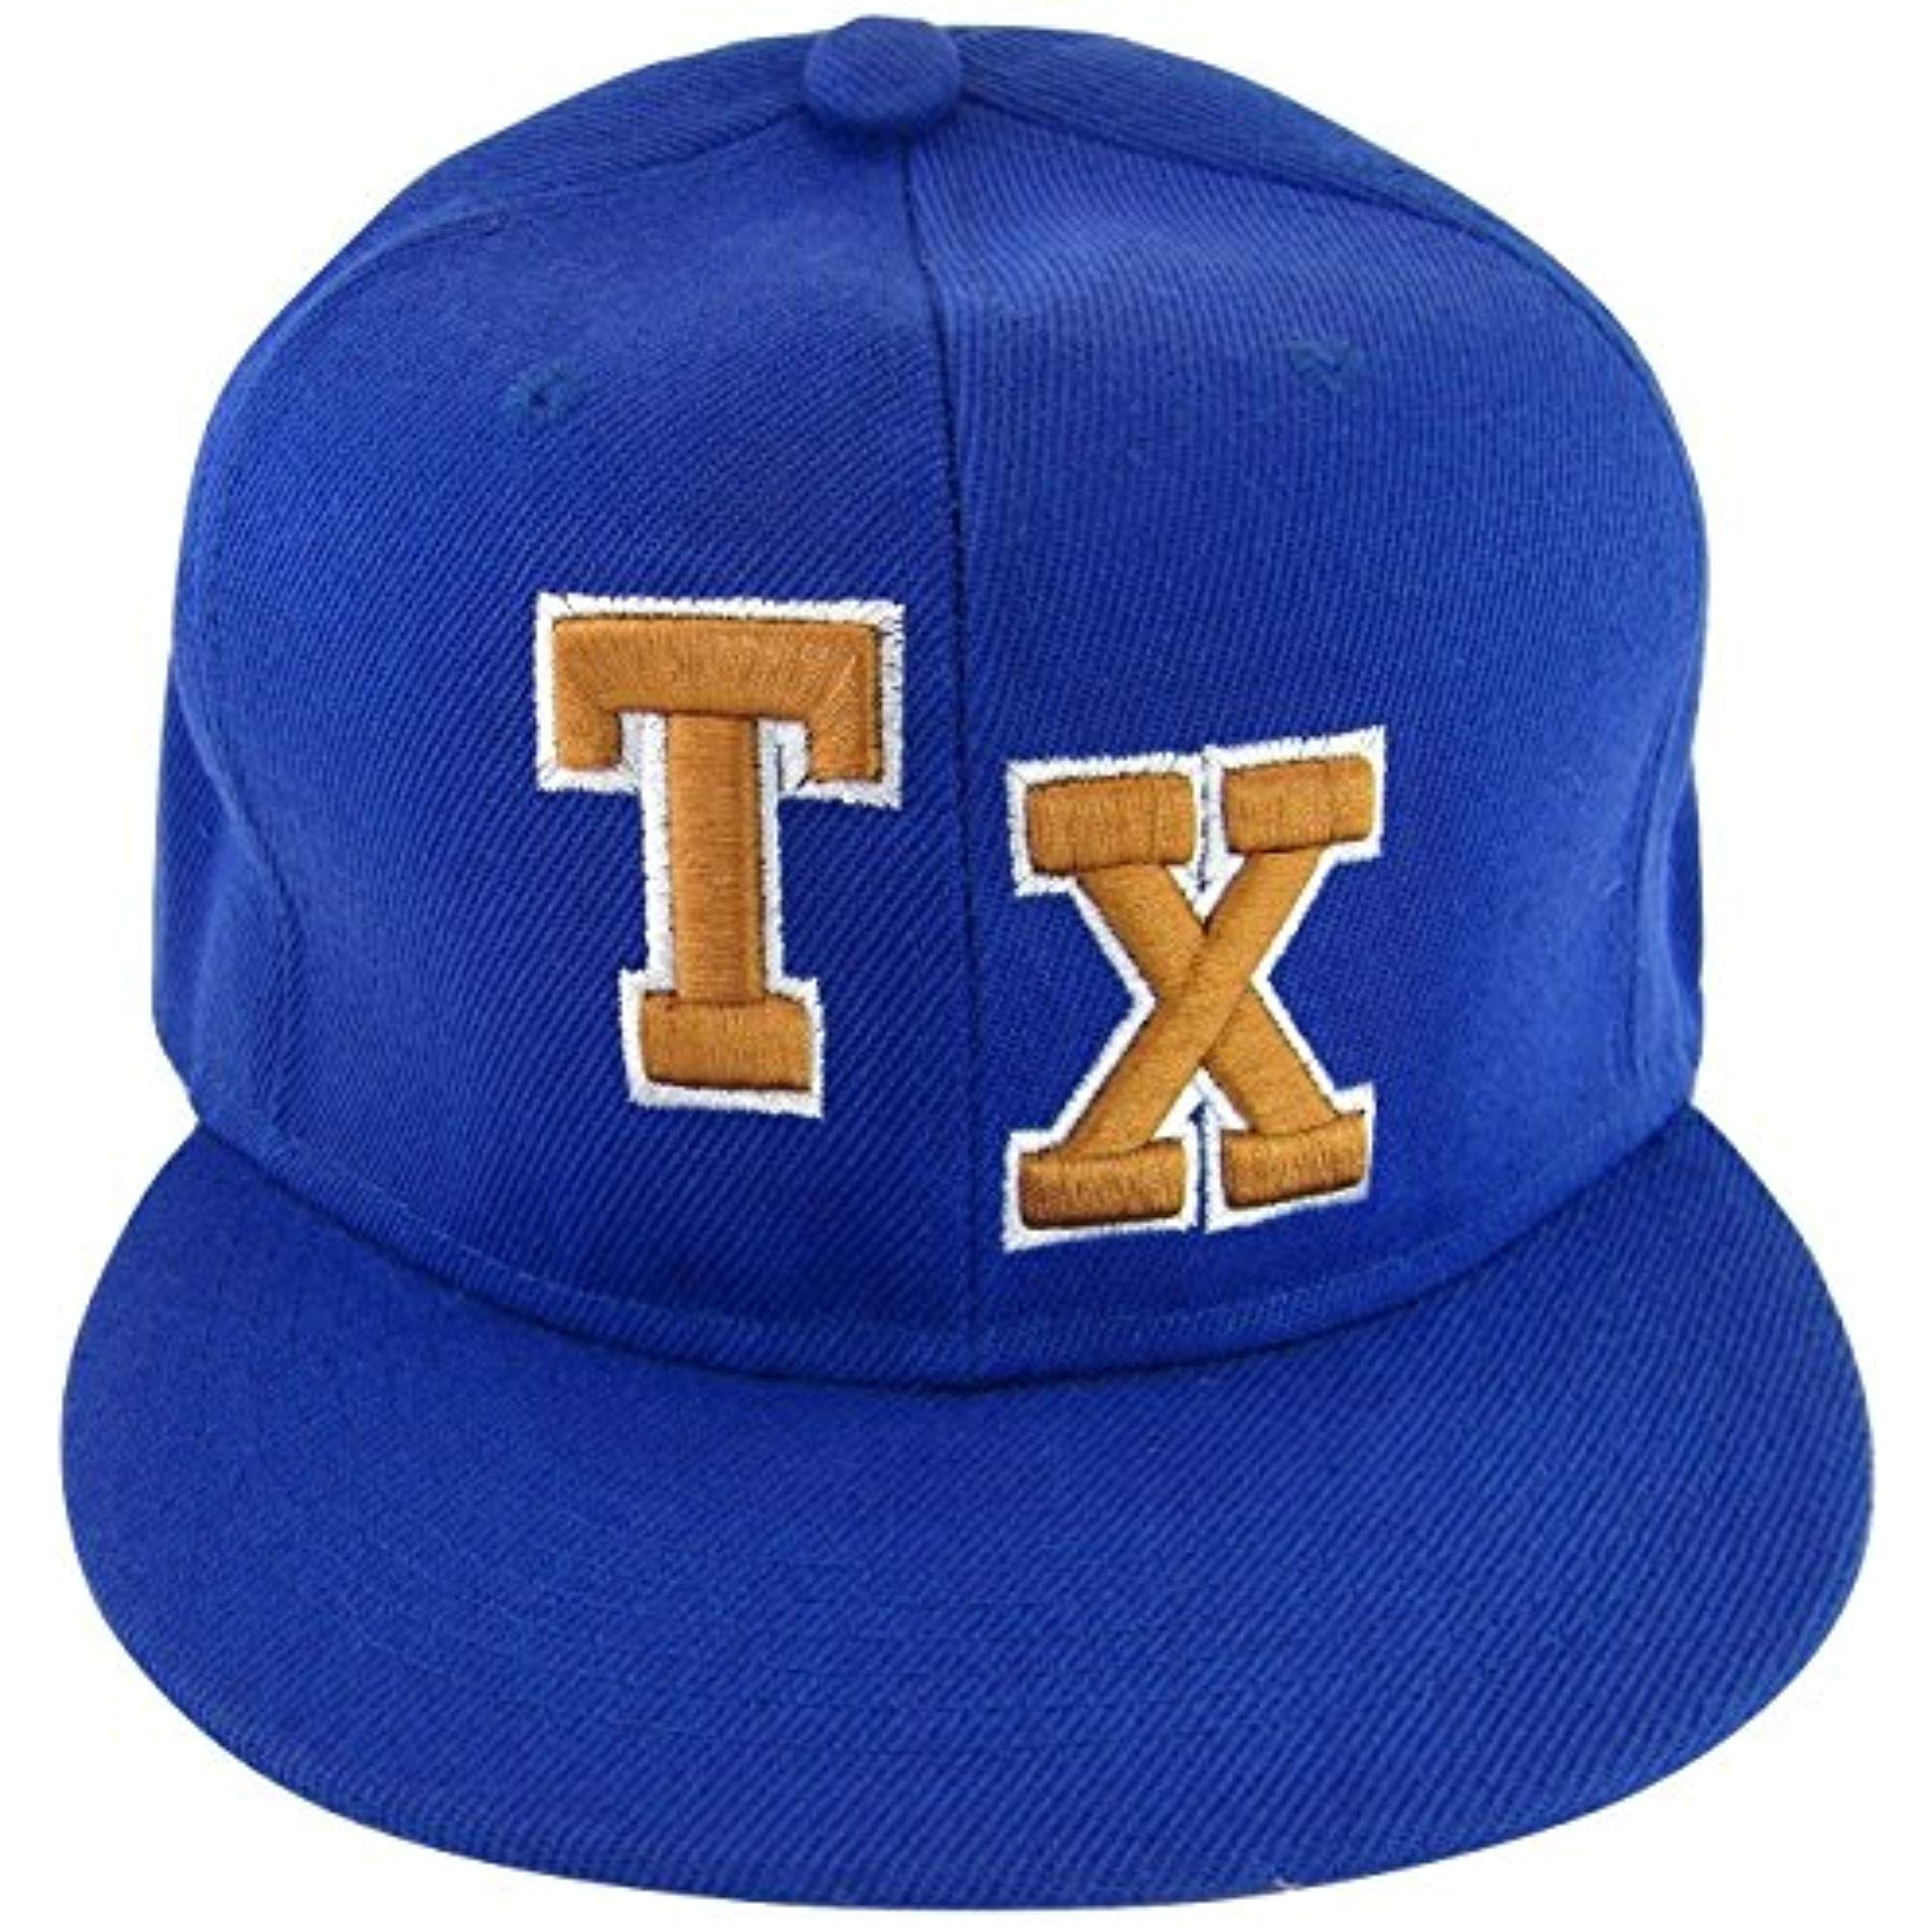 "Men TEXAS /""TX/"" FASHION Baseball Free Size Cap"